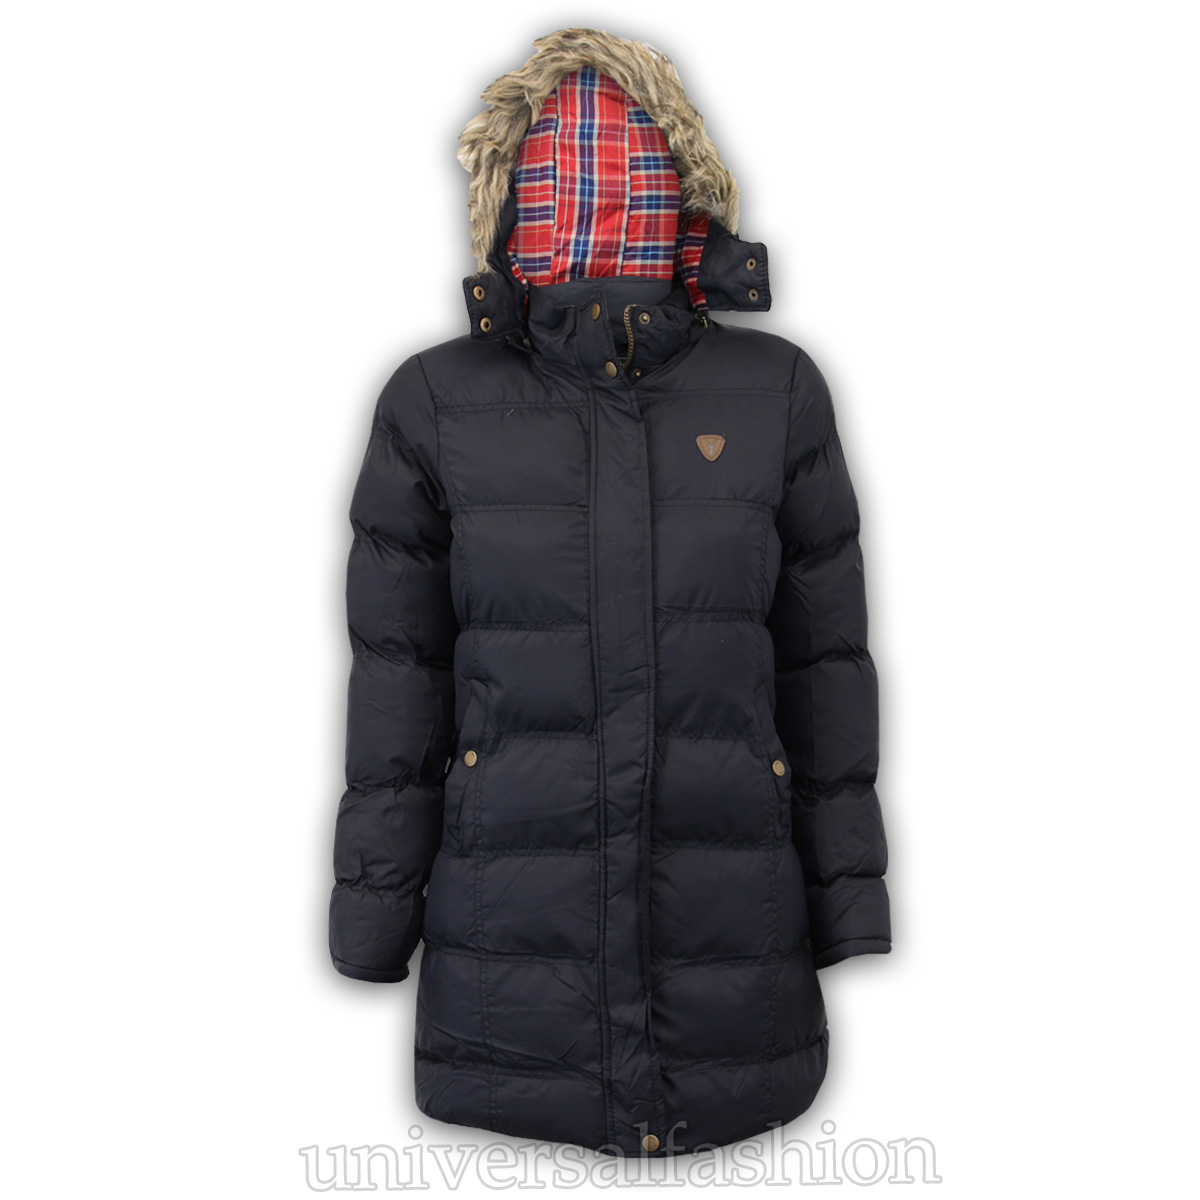 Girls Parka Jacket Brave Soul Kids Coat Hooded Padded Tartan Fur Lined Winter